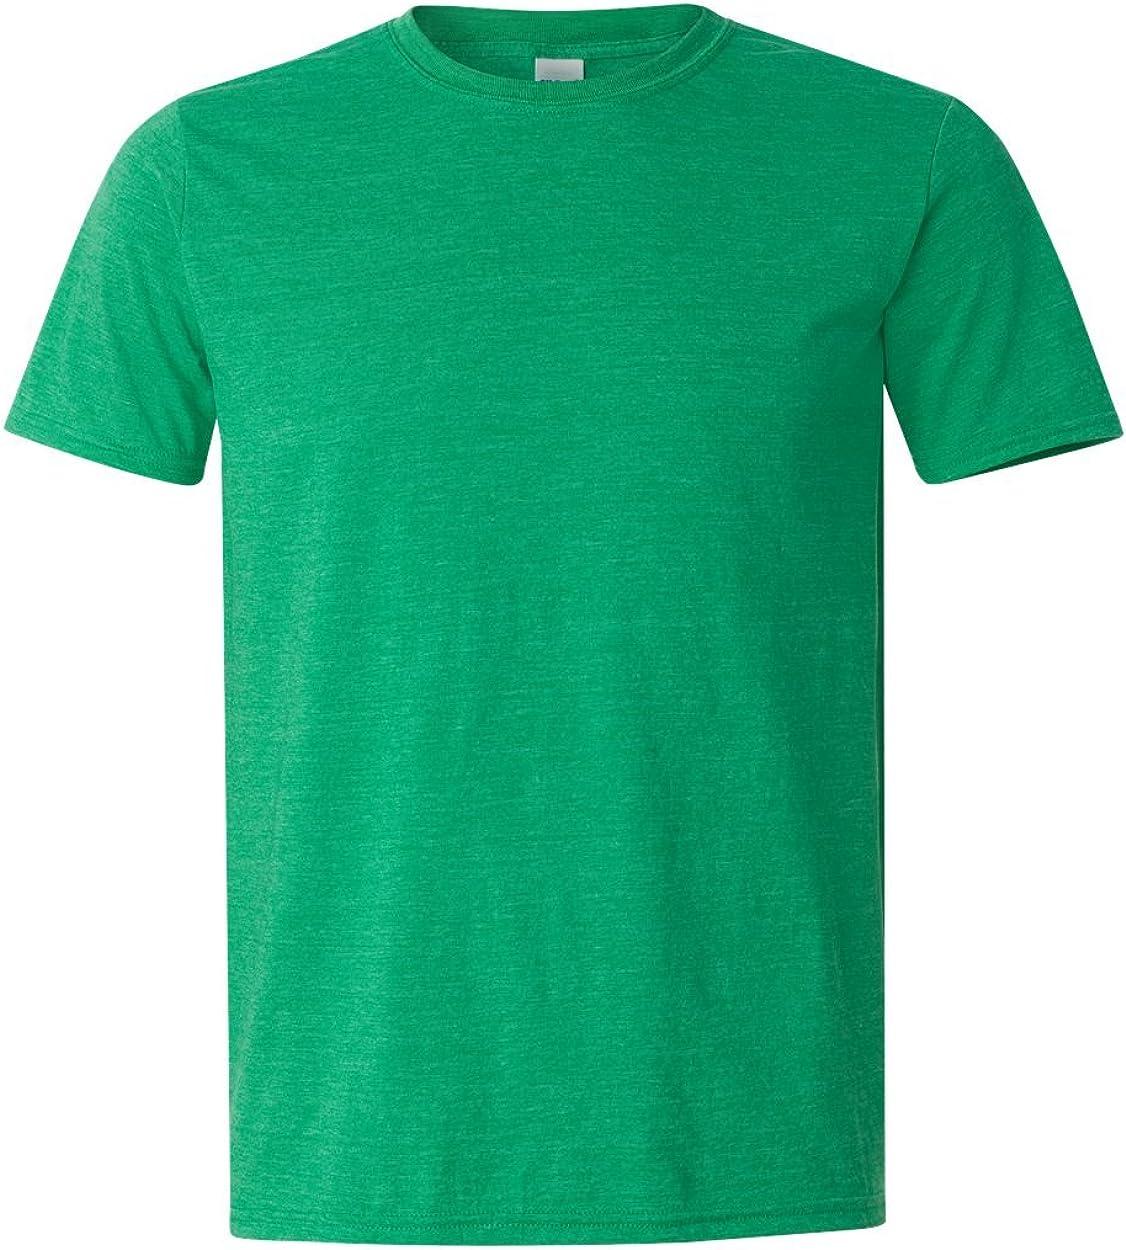 4.5 oz. T-Shirt (G640) Heather Irish Green, M (Pack of 12)